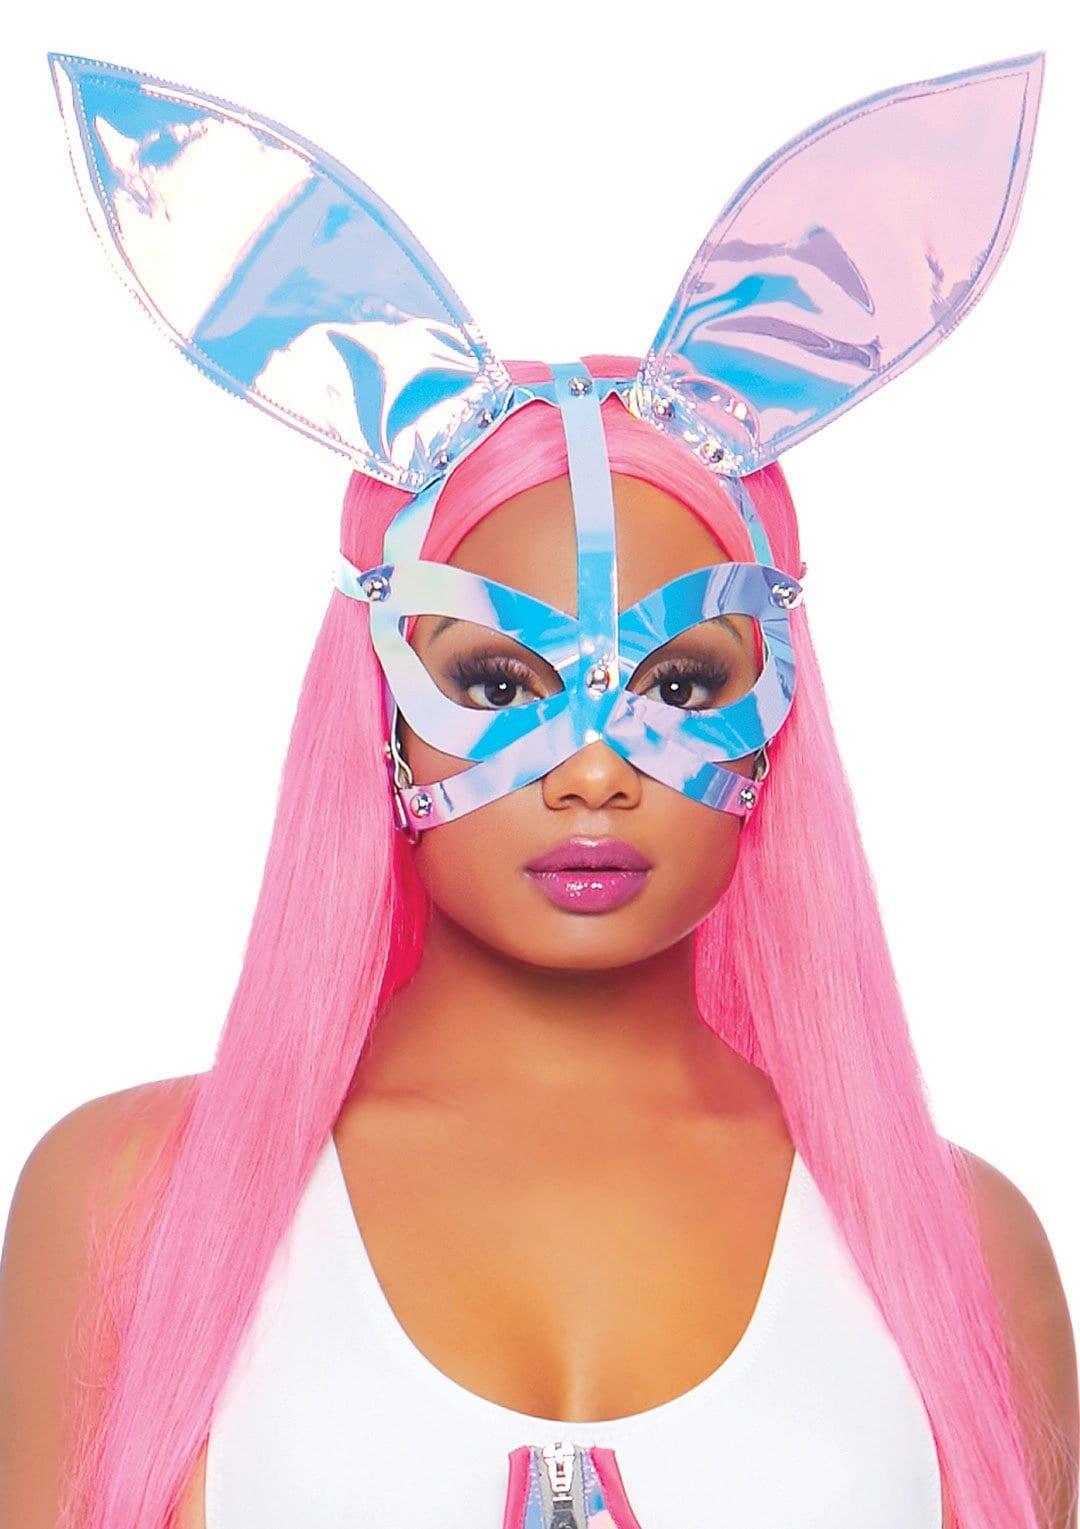 Holographic Bunny Ear Vinyl Mask 3